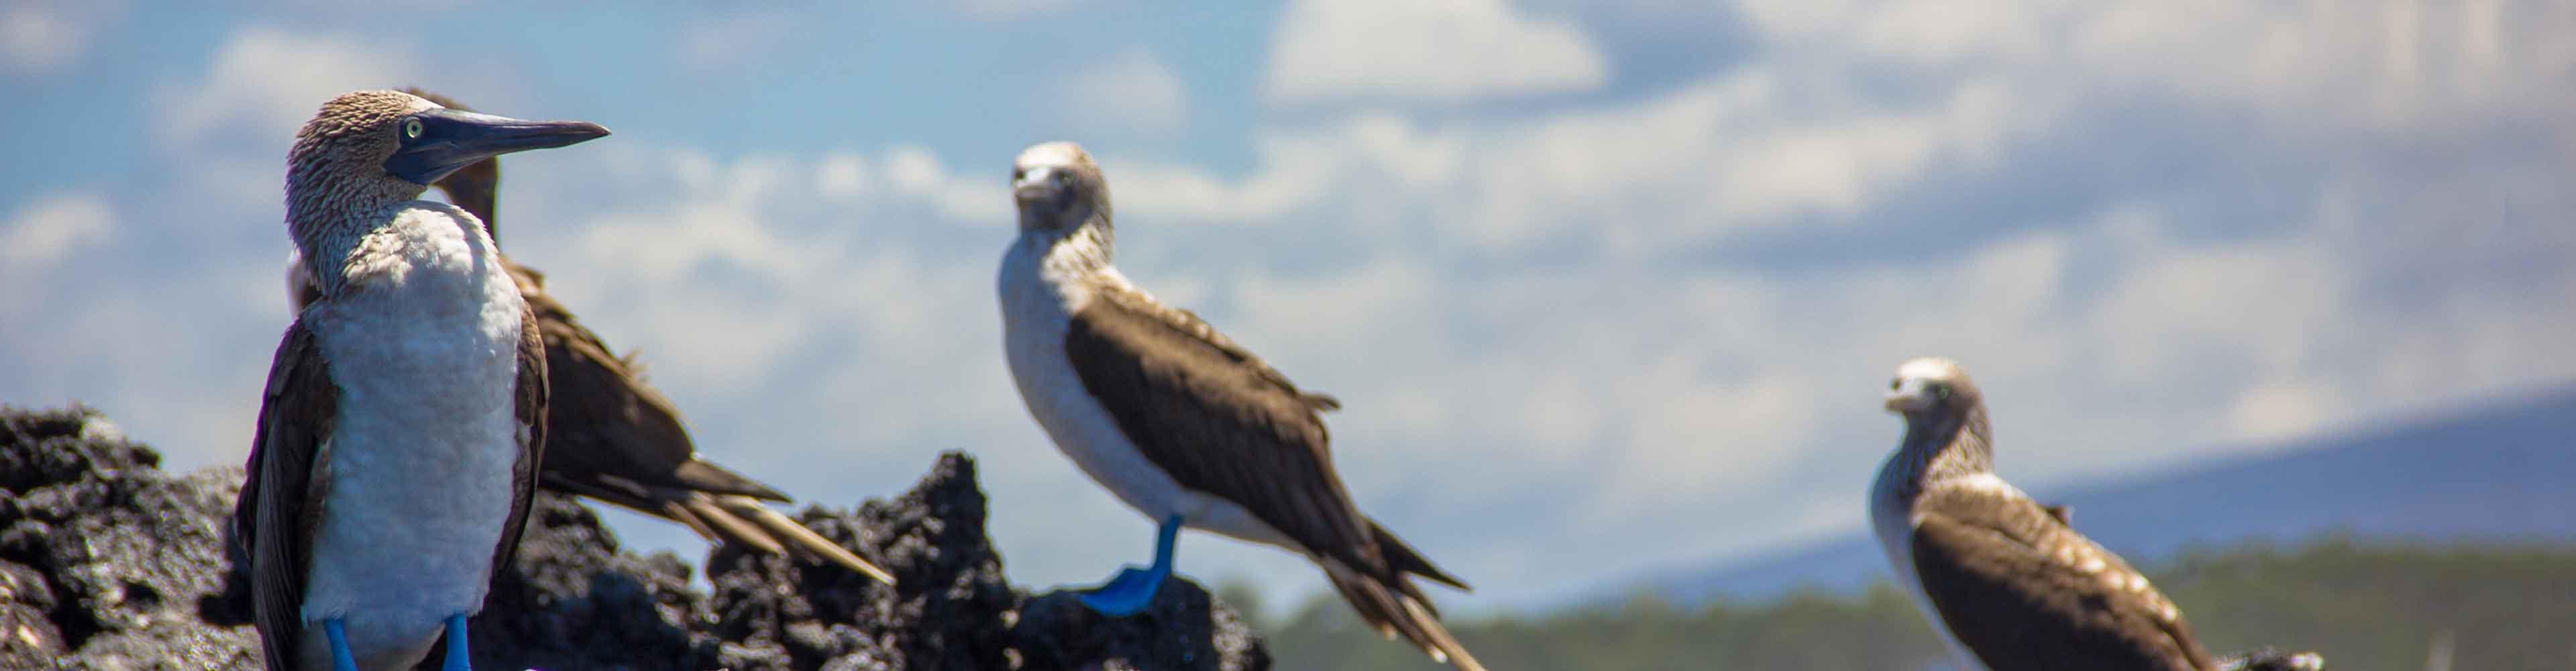 Galapagos Explorer – Southern Islands  (Grand Queen Beatriz)